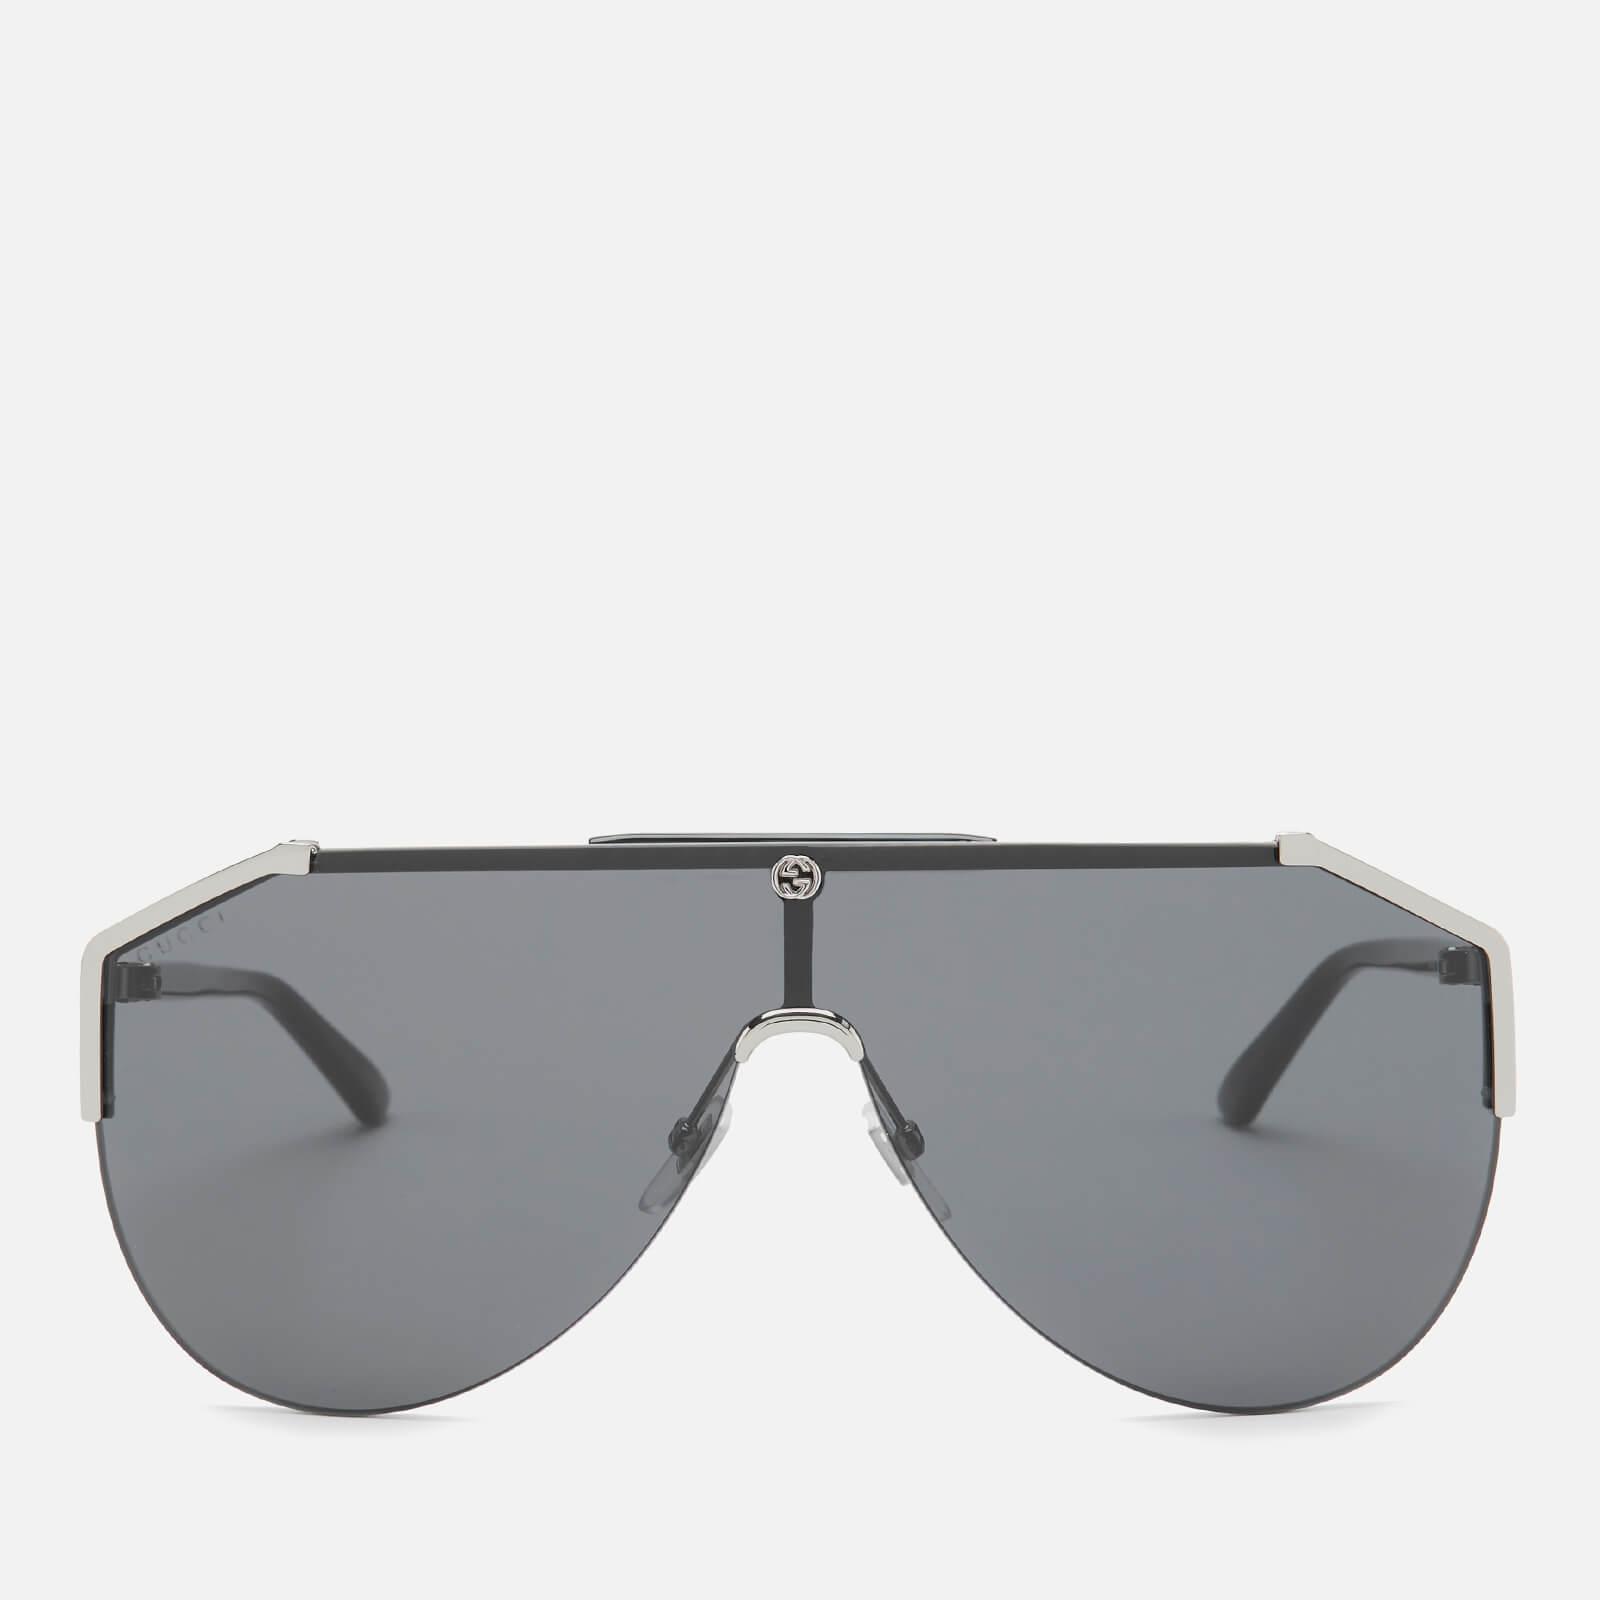 Gucci Men's Mask Sunglasses - Ruthenium/Black/Grey